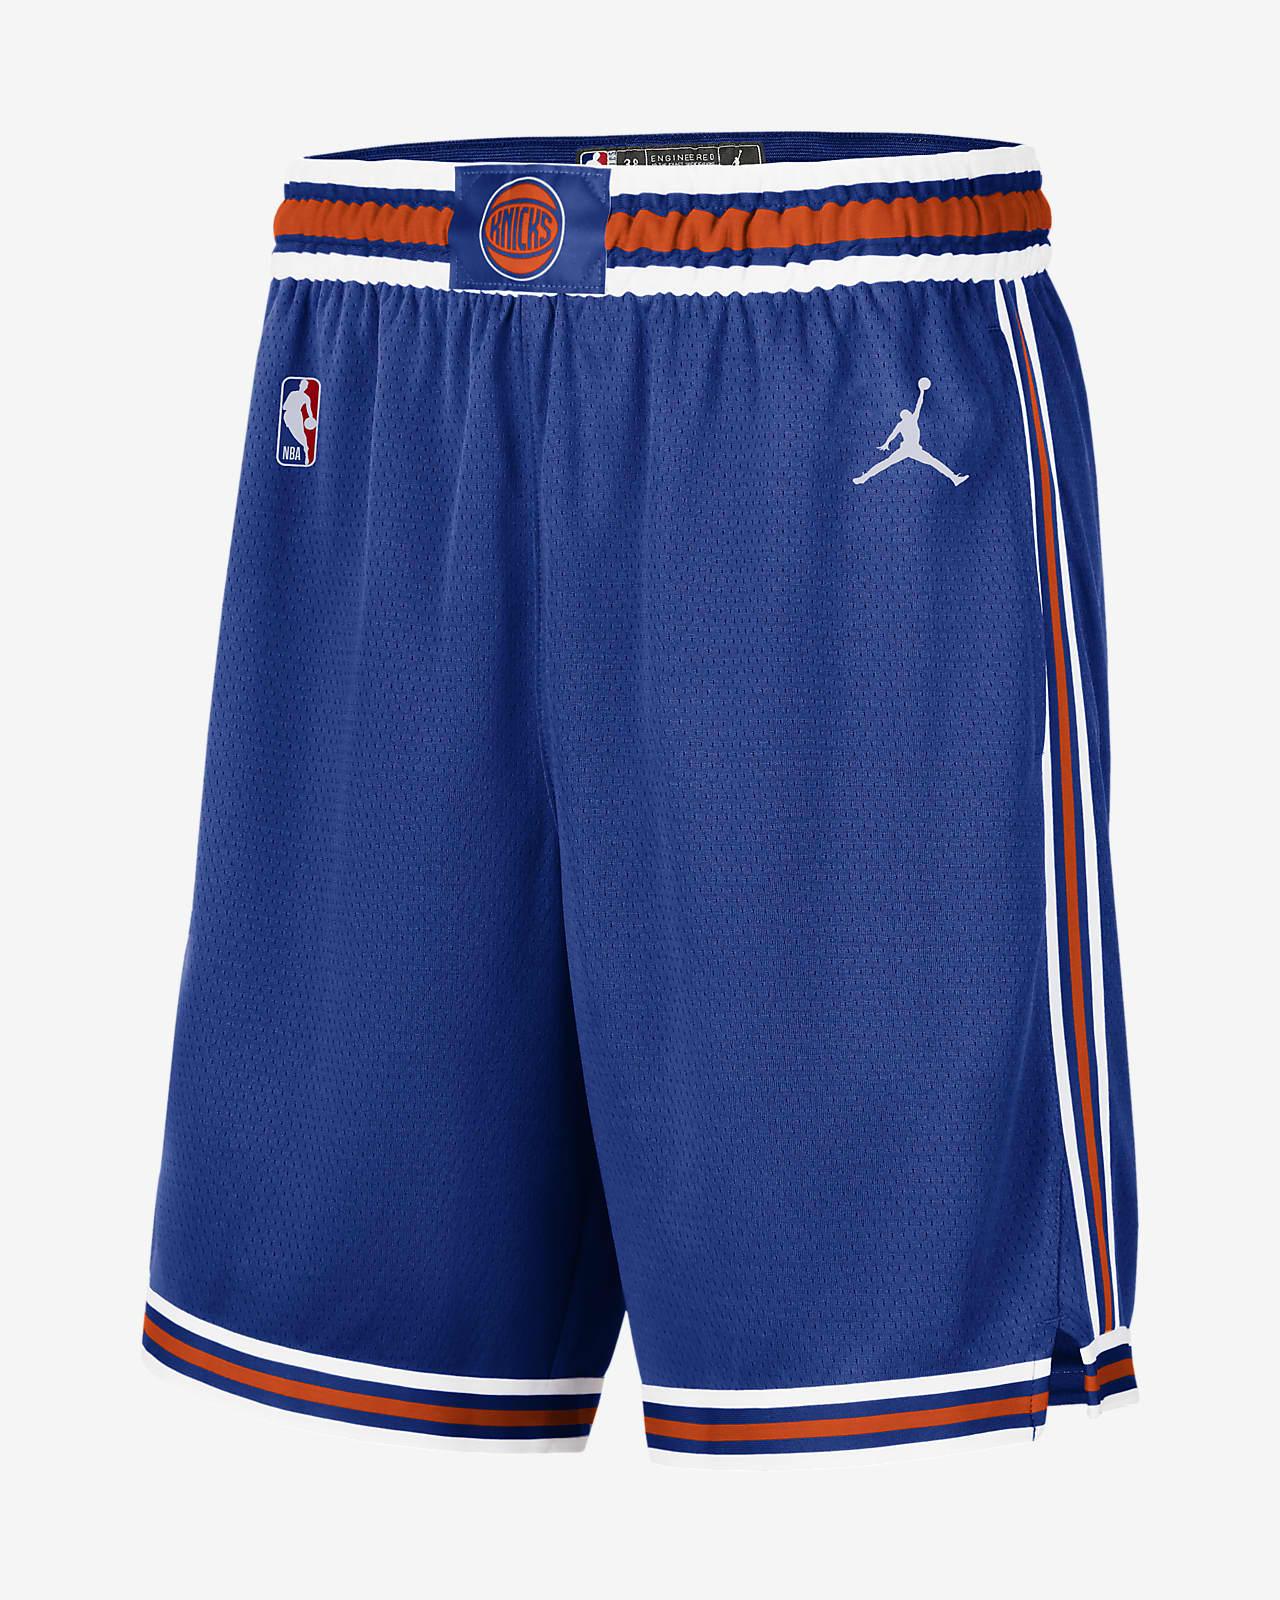 Knicks Statement Edition 2020 Men's Jordan NBA Swingman Shorts